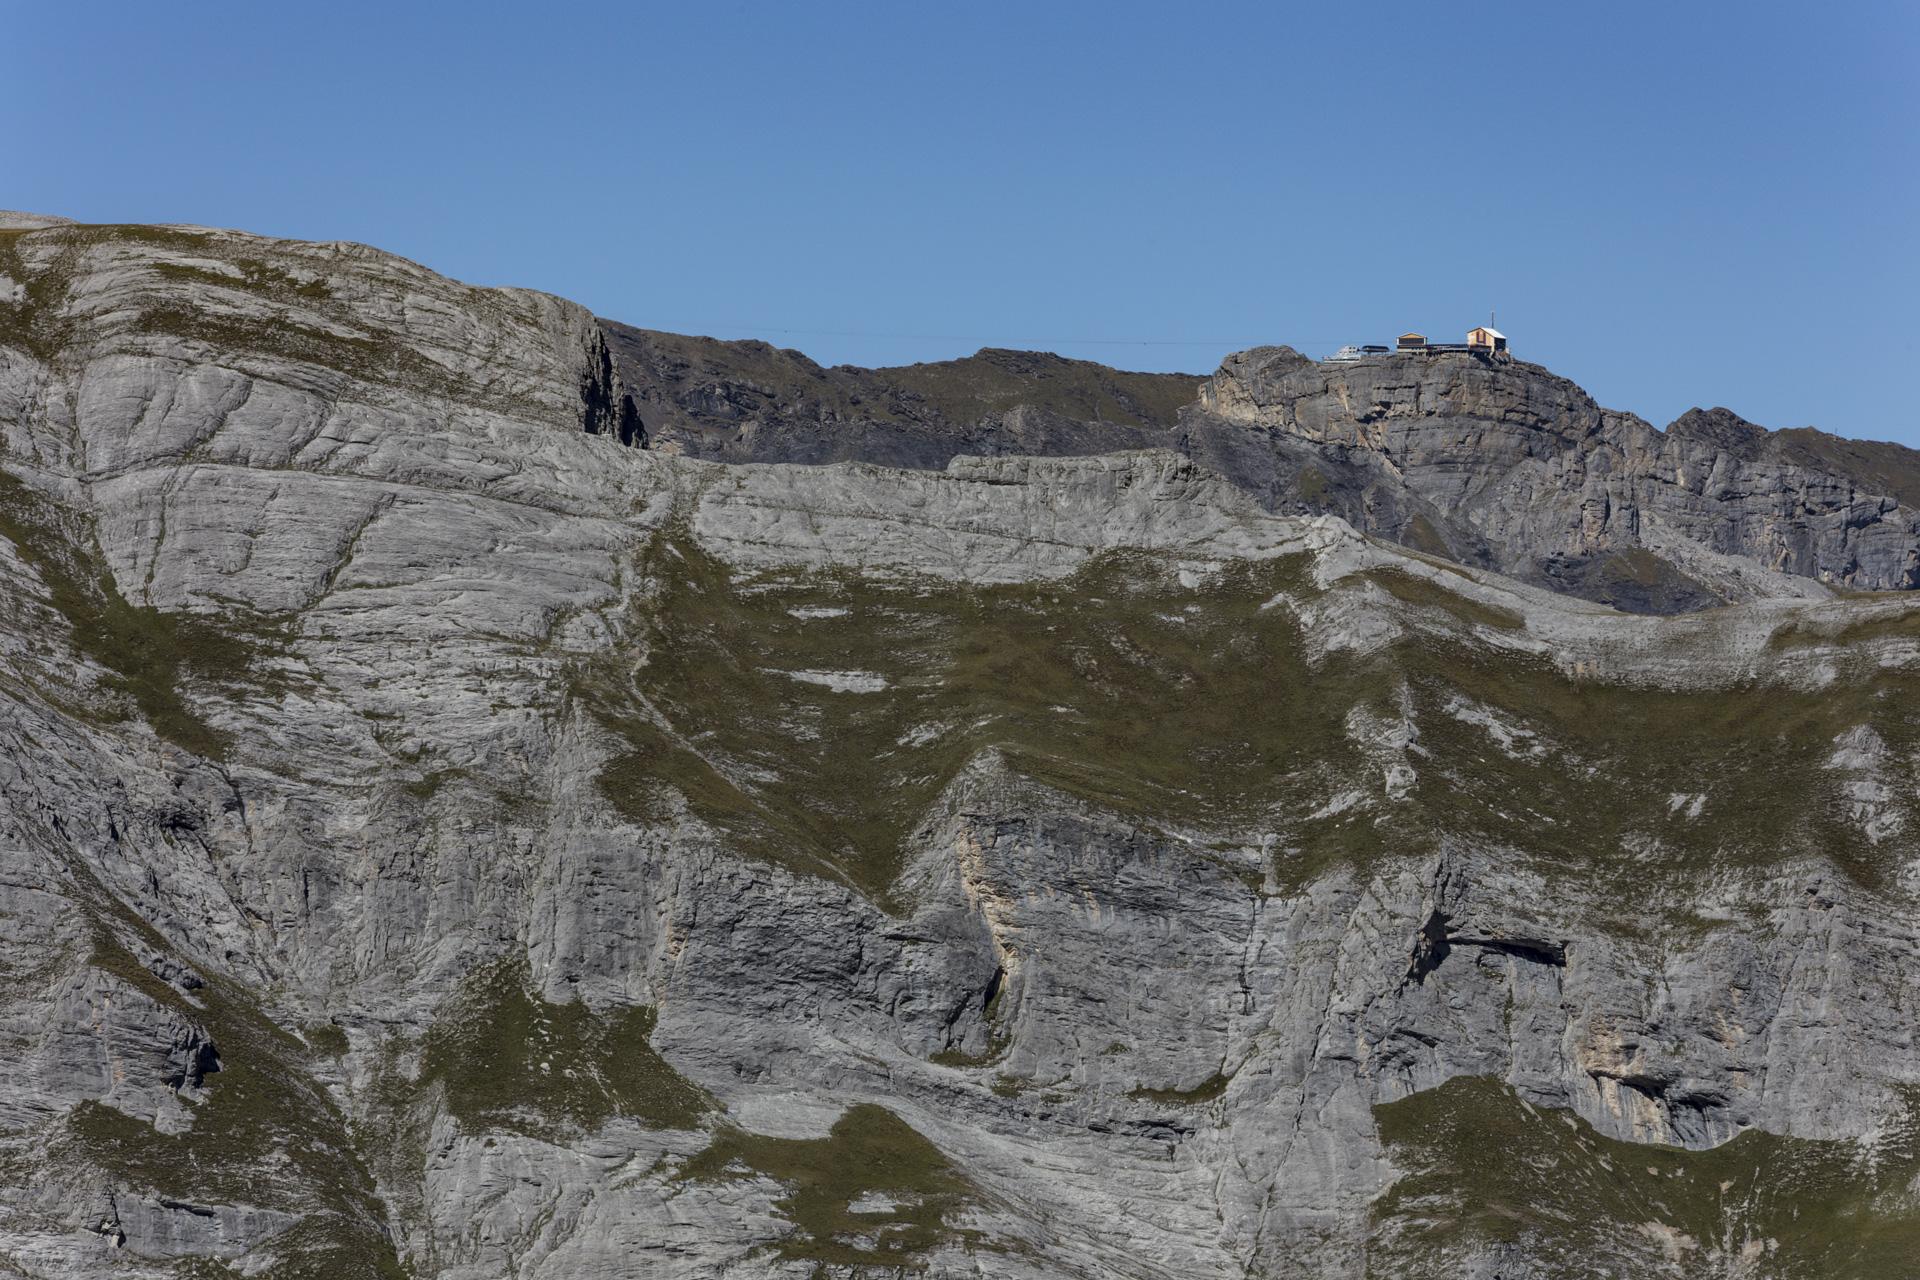 Berner-Oberland_20150921_3158-1